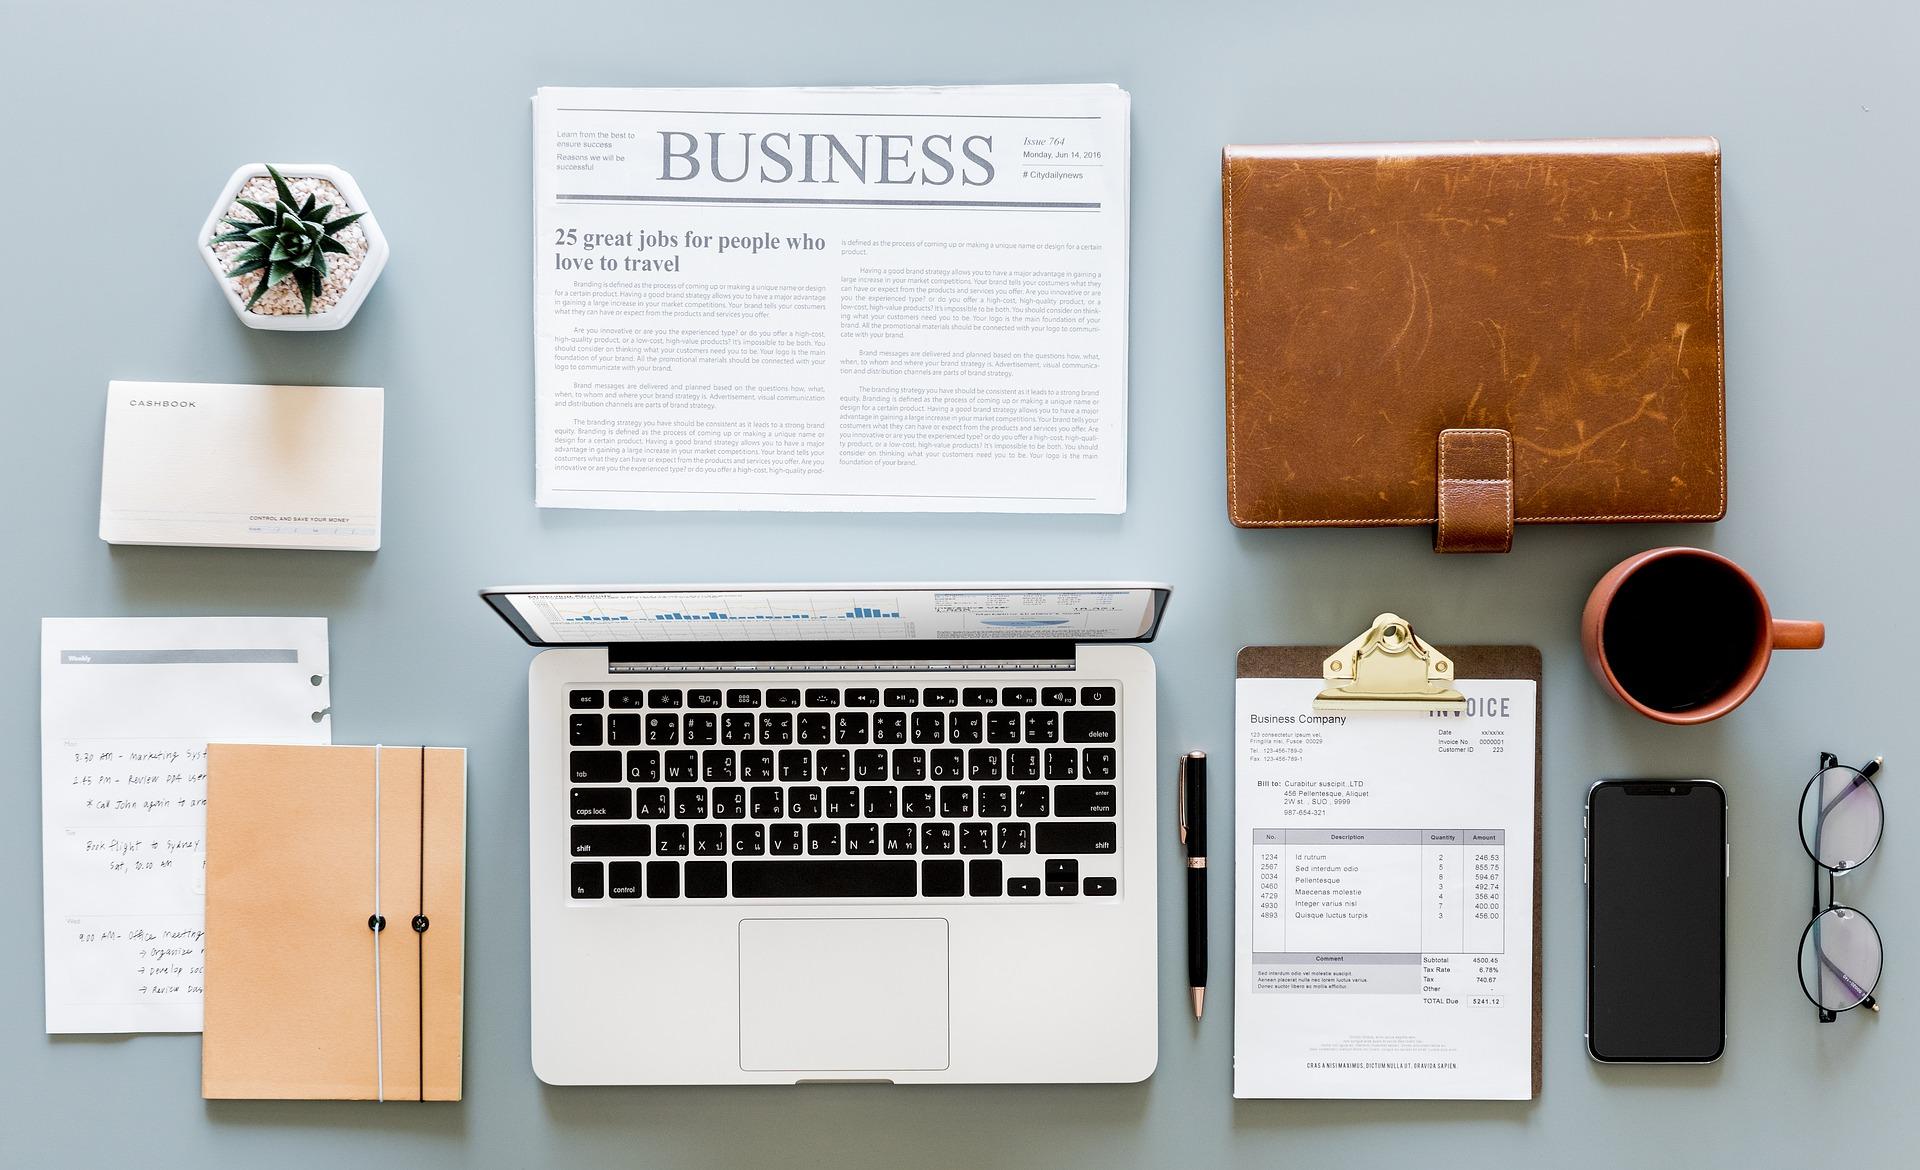 tietokone, kahvikuppi, puhelin ja kalenteri